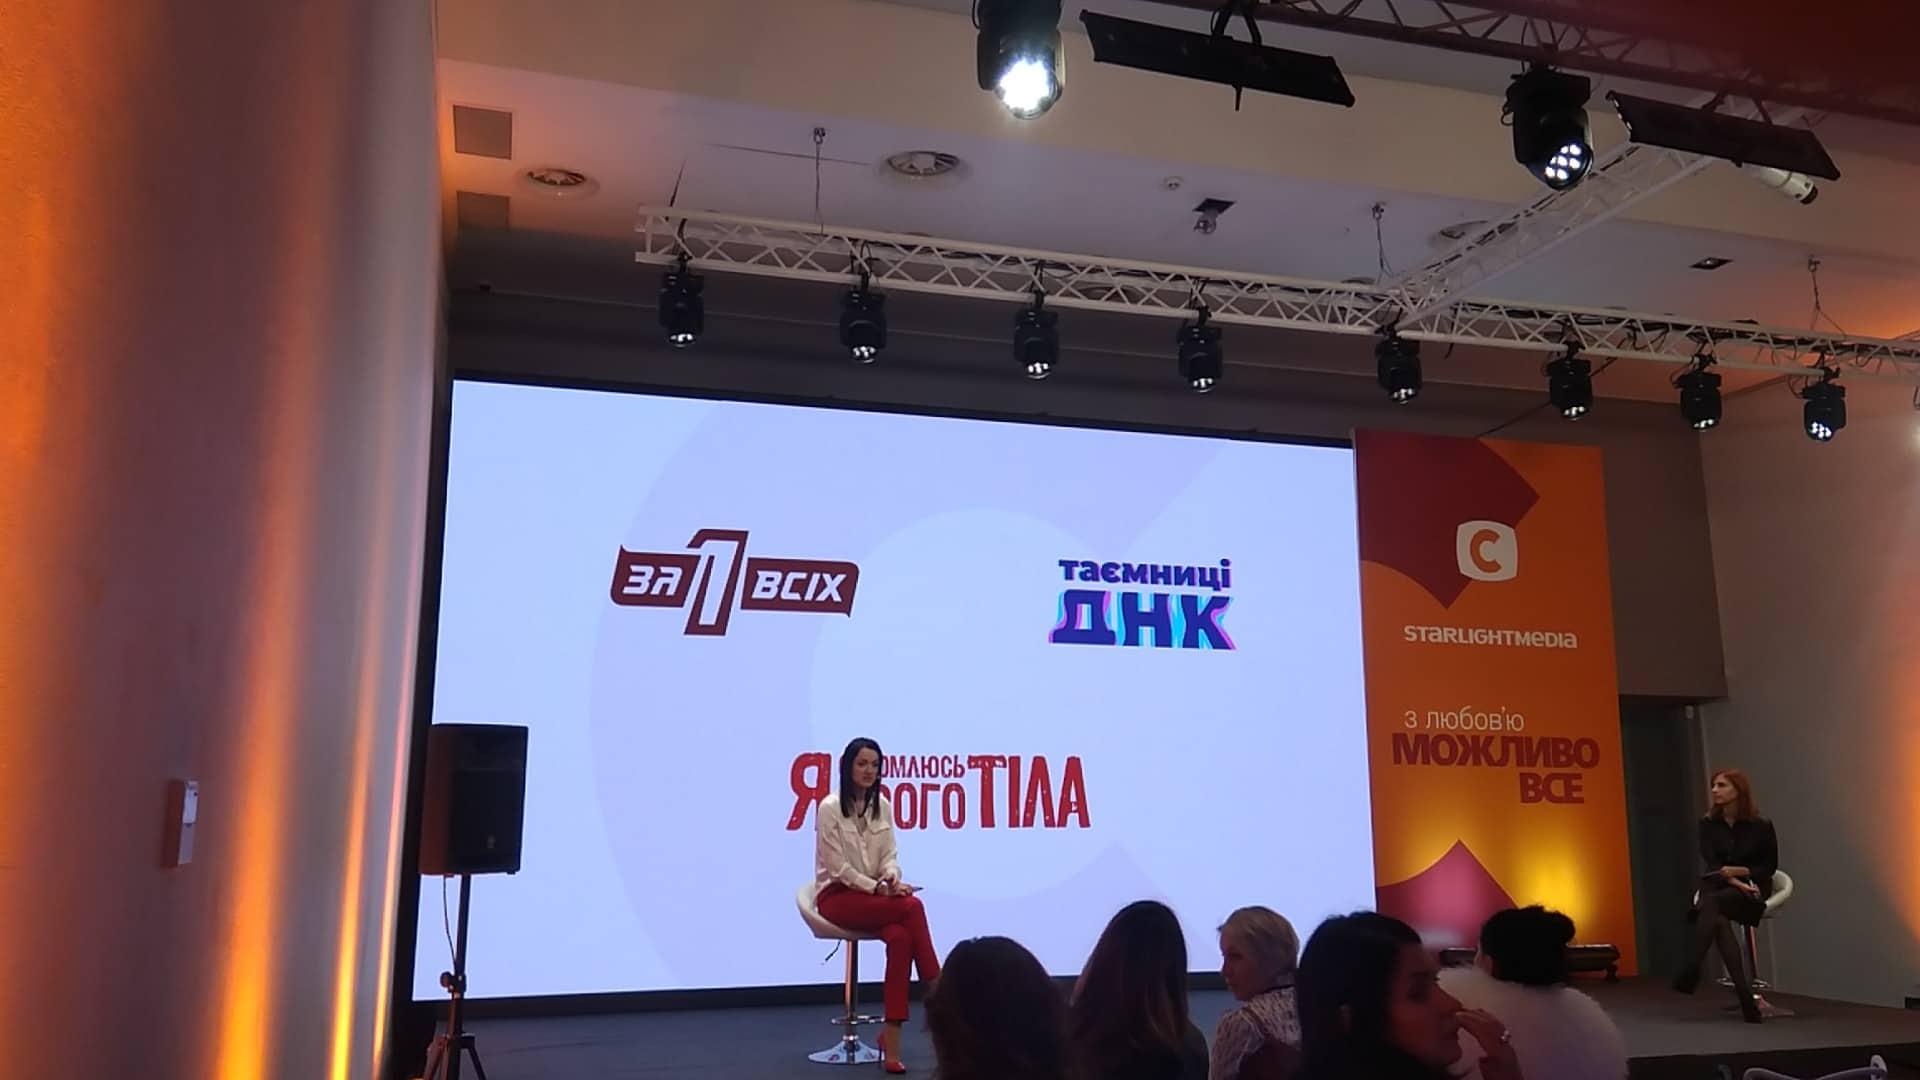 https://telekritika.ua/tk-static/2020/01/prezentcija-novogo-sezona-stb-23-01-2020.jpg